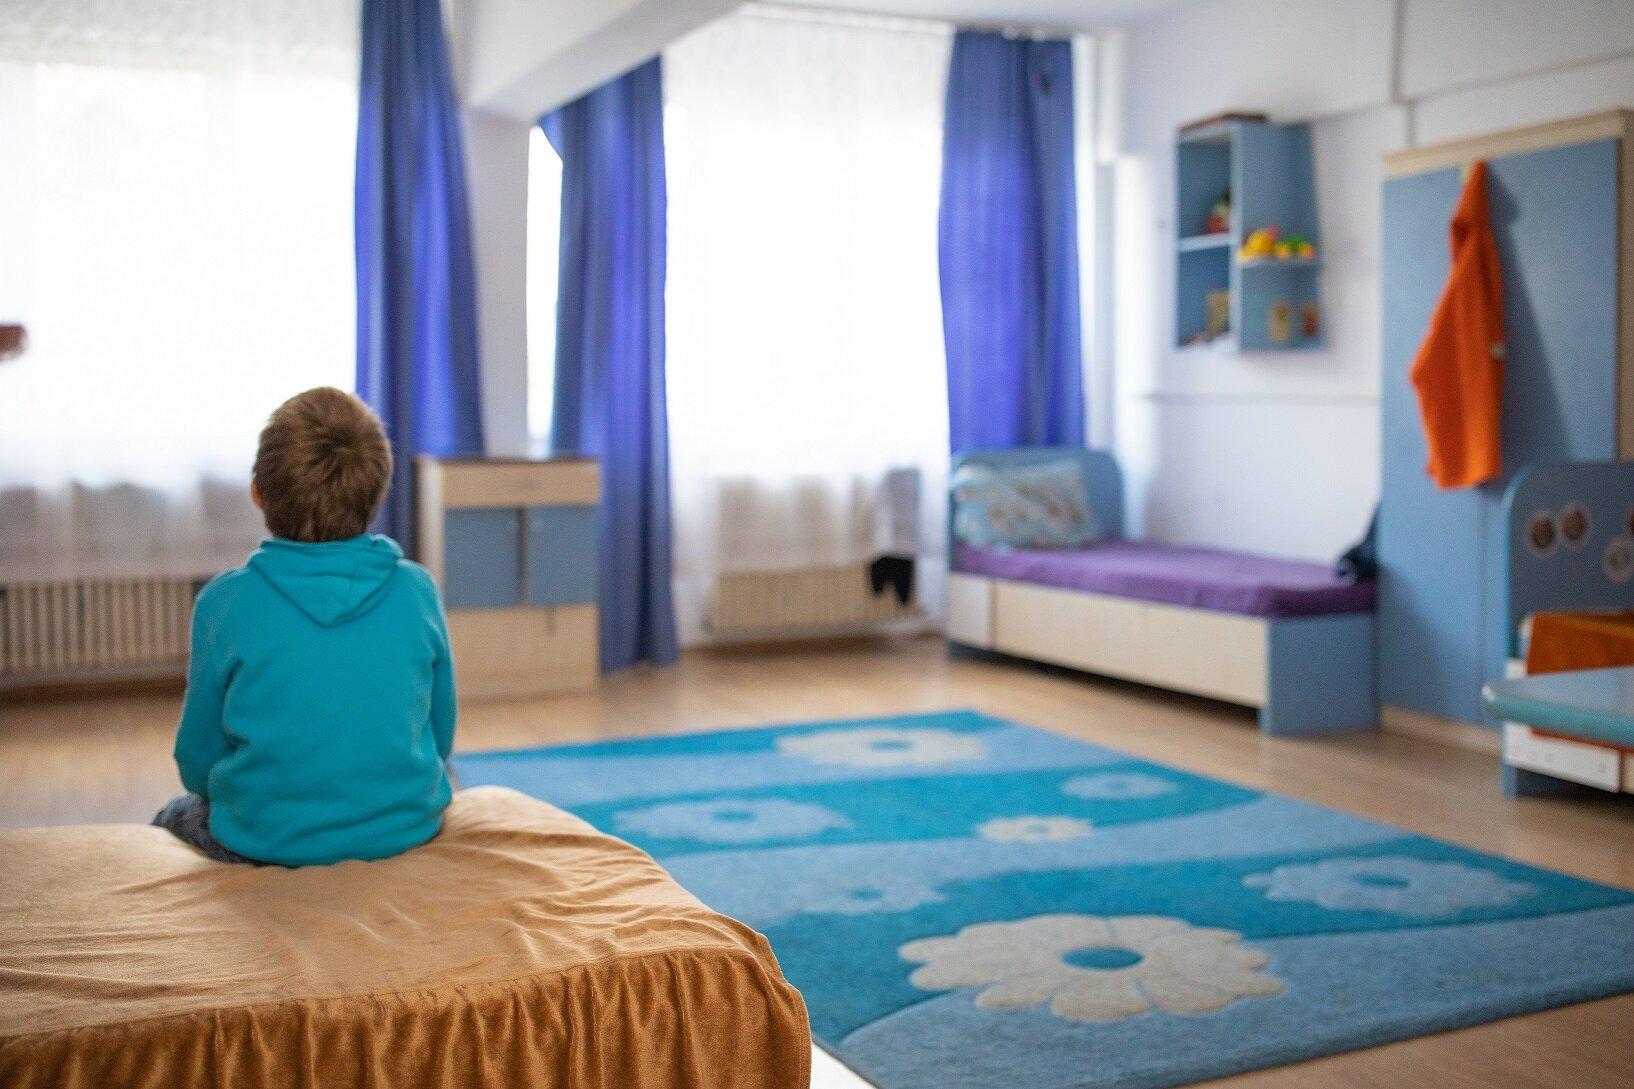 Centrul de Plasament Elena Doamna_02_foto Ciprian Alupoae.jpg